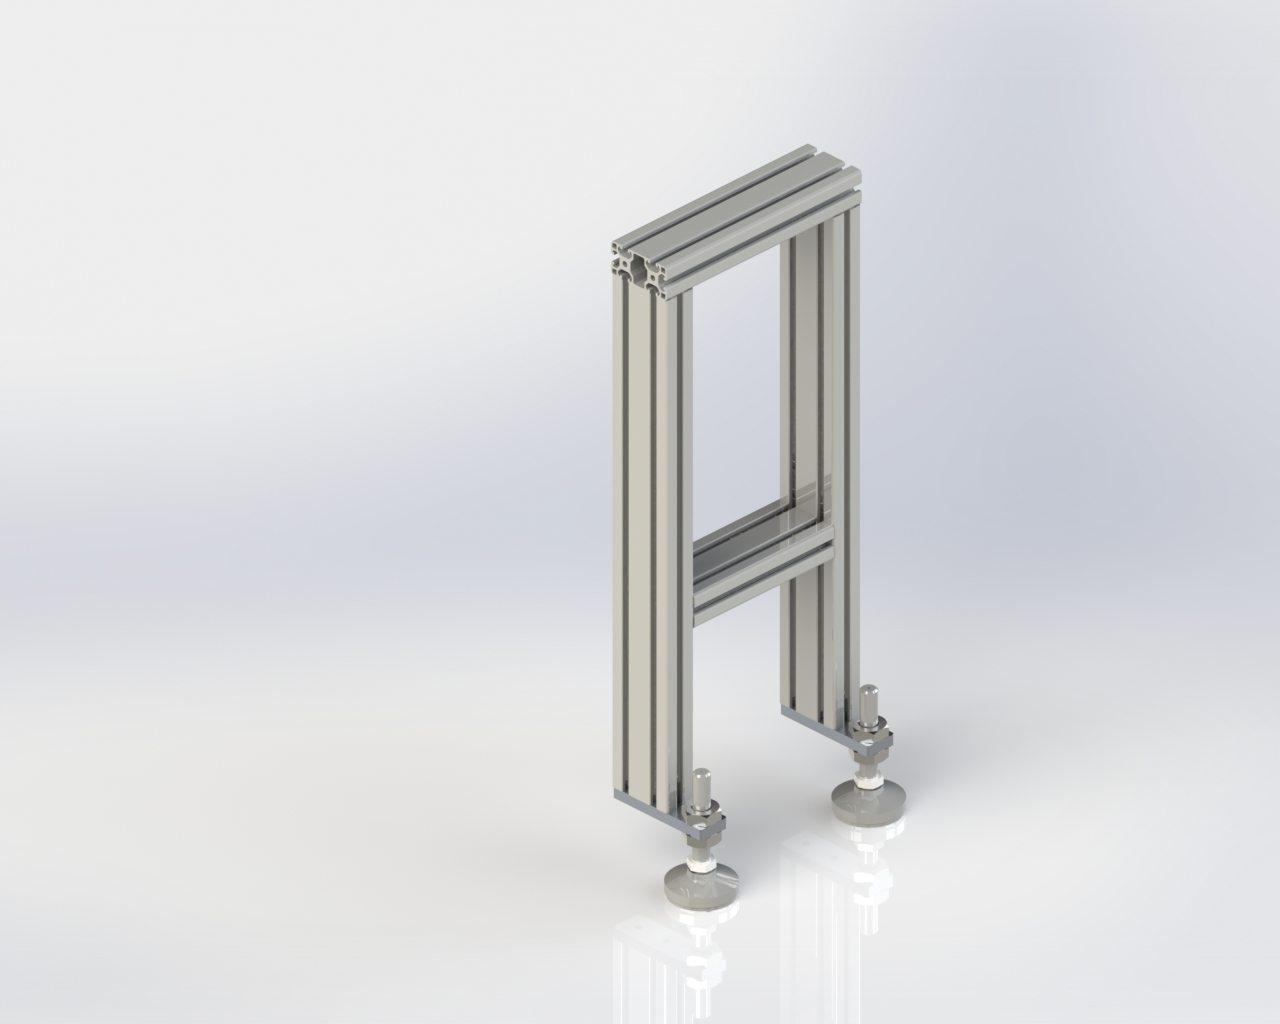 Model 55 Fixed Floor Stand